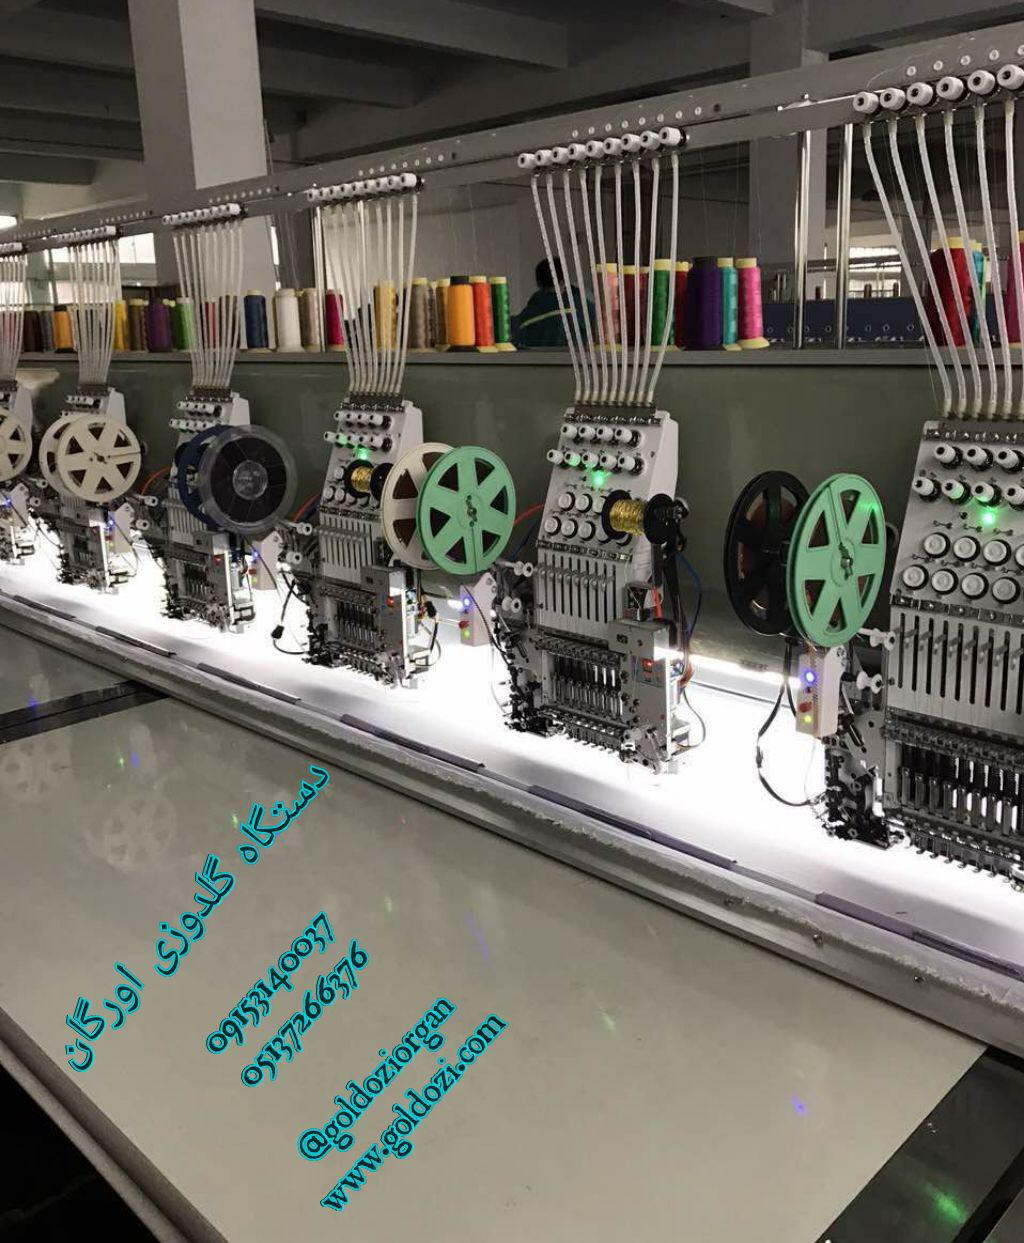 نمايندگي انحصاري دستگاههاي گلدوزي كامپيوتري اورگان در آسیا